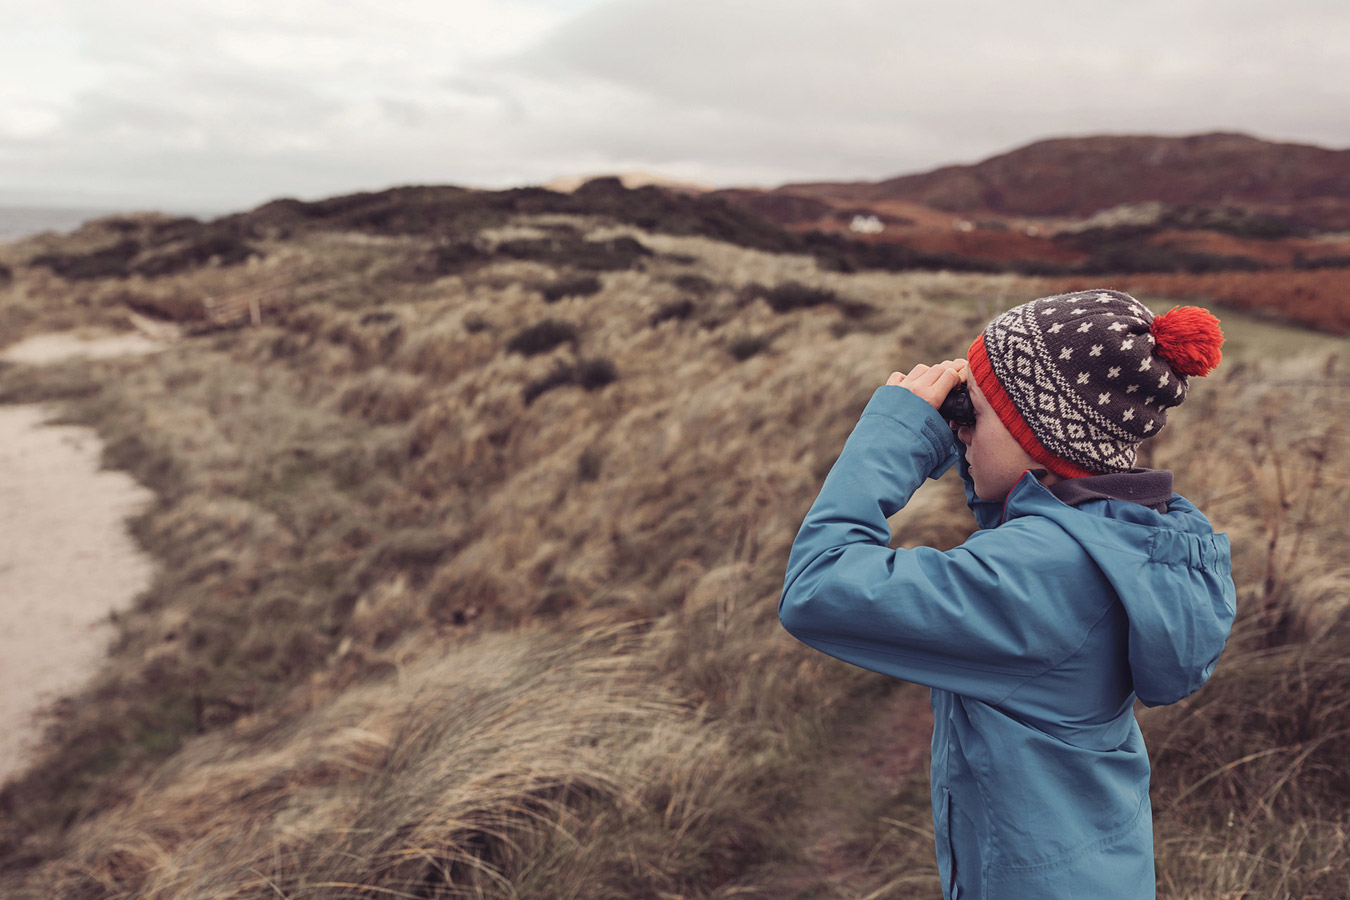 """Untitled"", © Tiree Dawson, Kendal, Cumbria, United Kingdom, Children, Rangefinder Family Photography Contest"